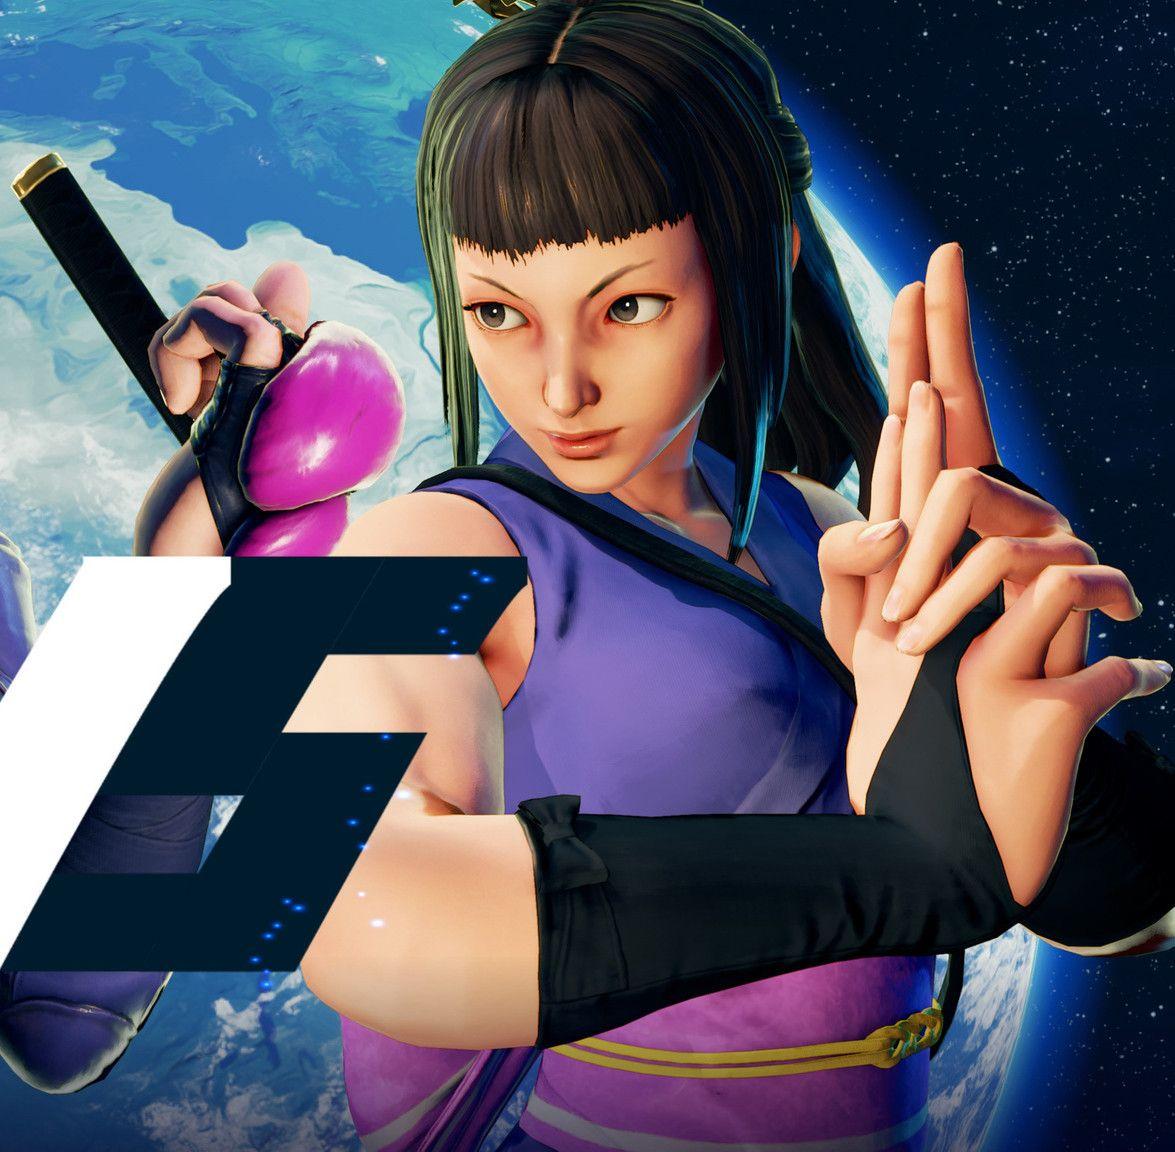 Street Fighter 5 Character Artist Street Fighter 5 VOLTA